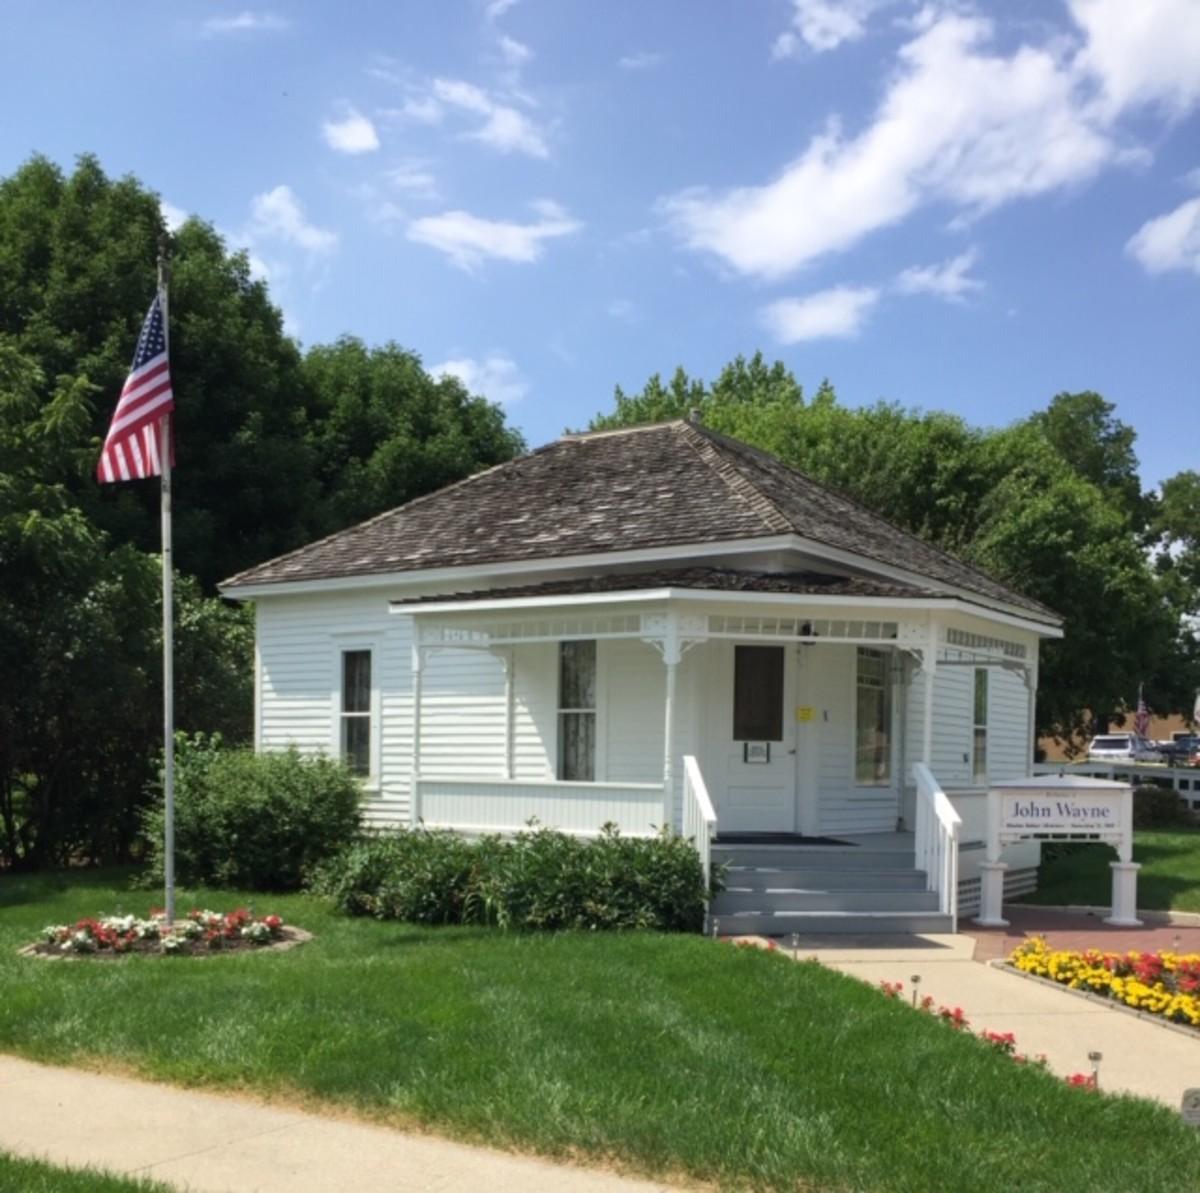 John Wayne Birthplace Home